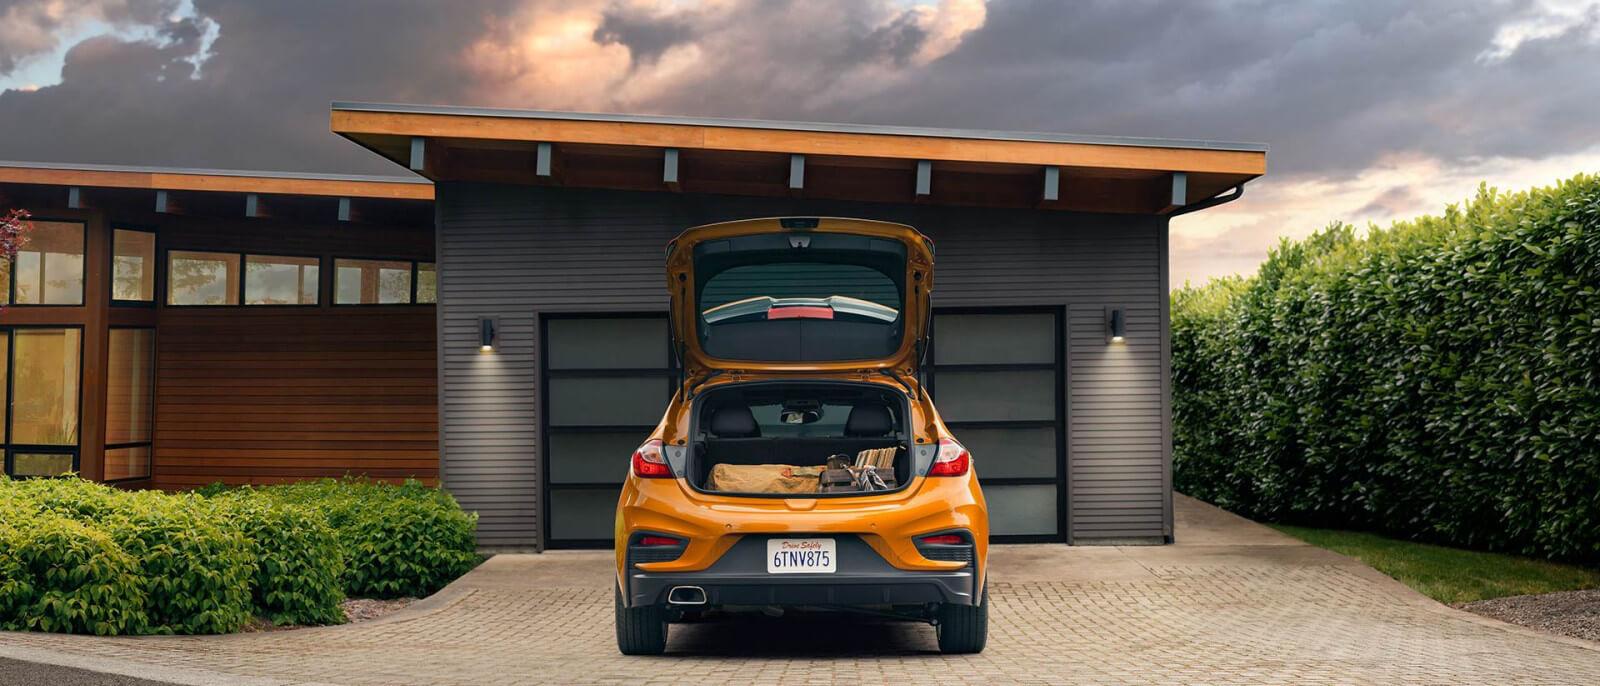 Chevrolet Cruze Hatchback cargo space